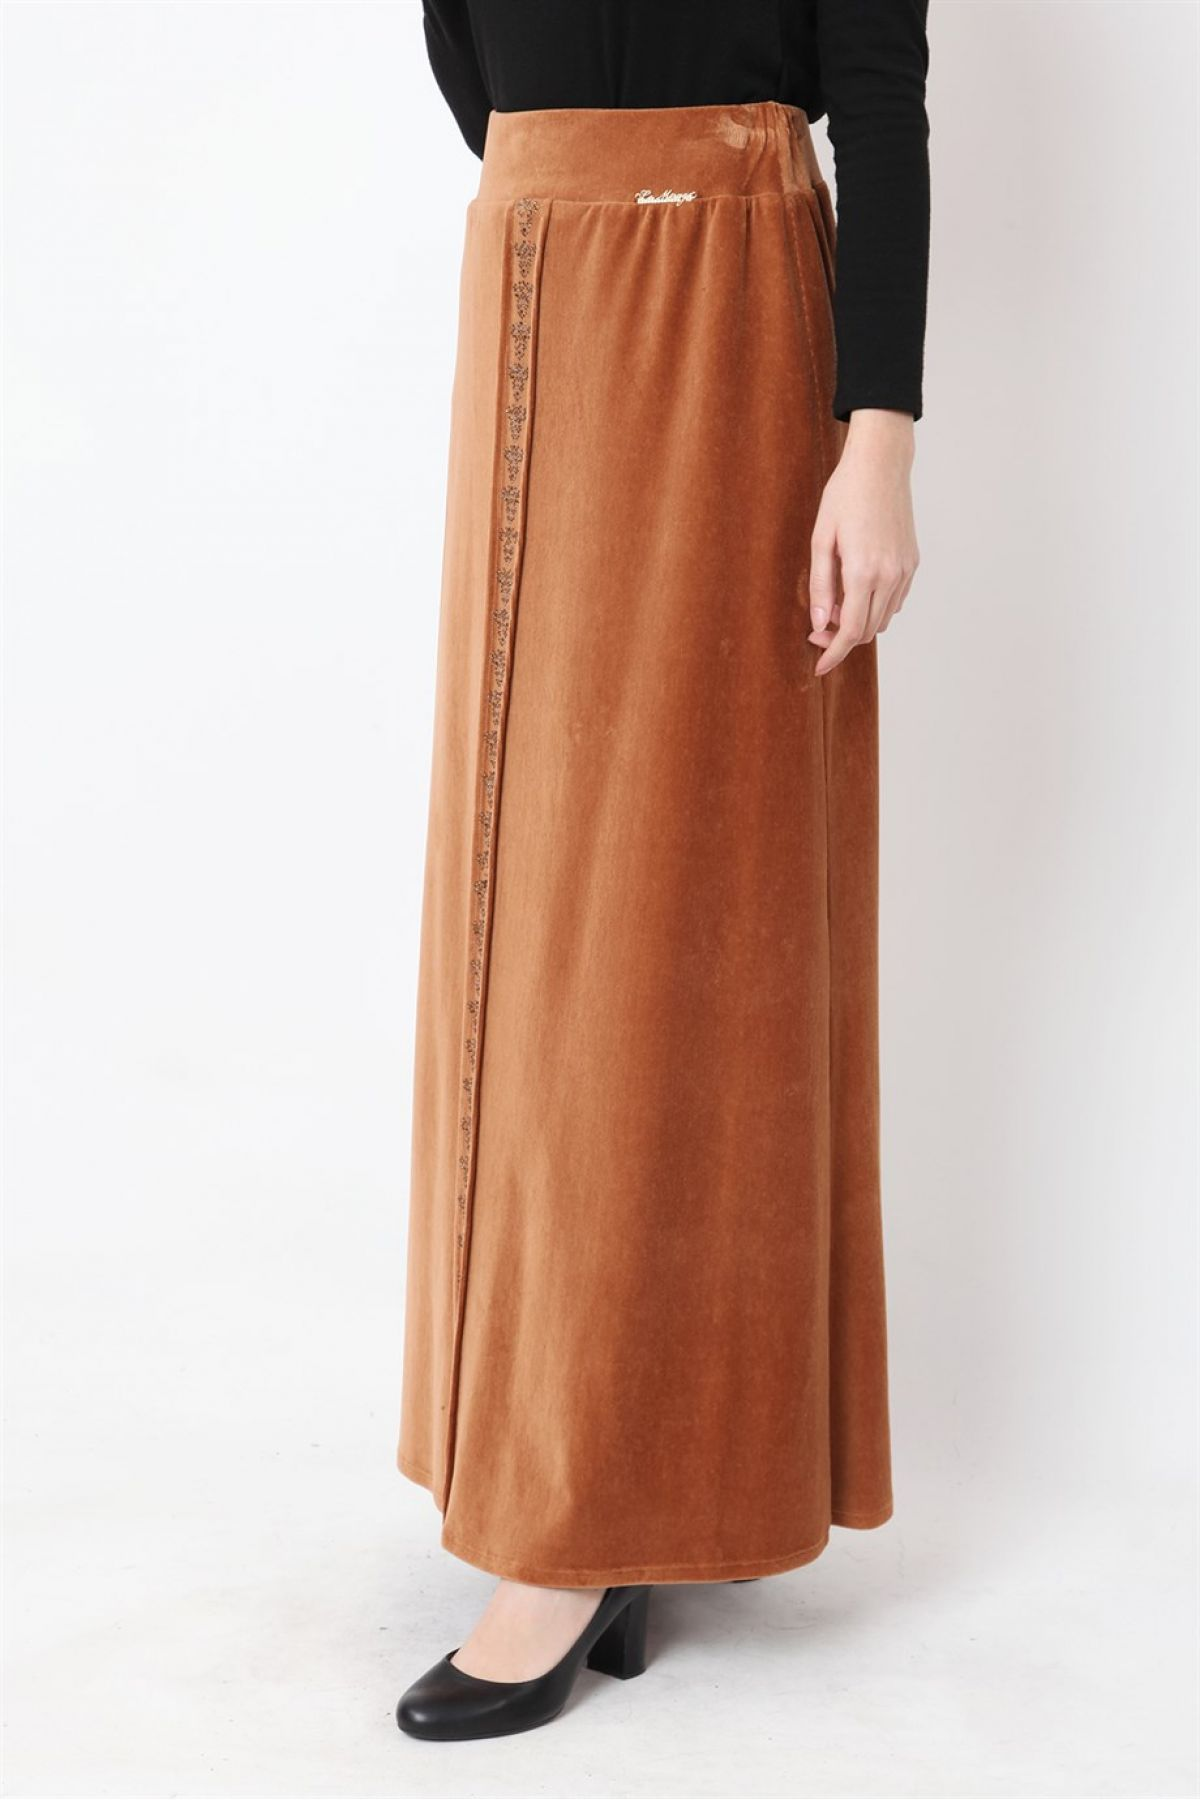 Long Skirts-Mink